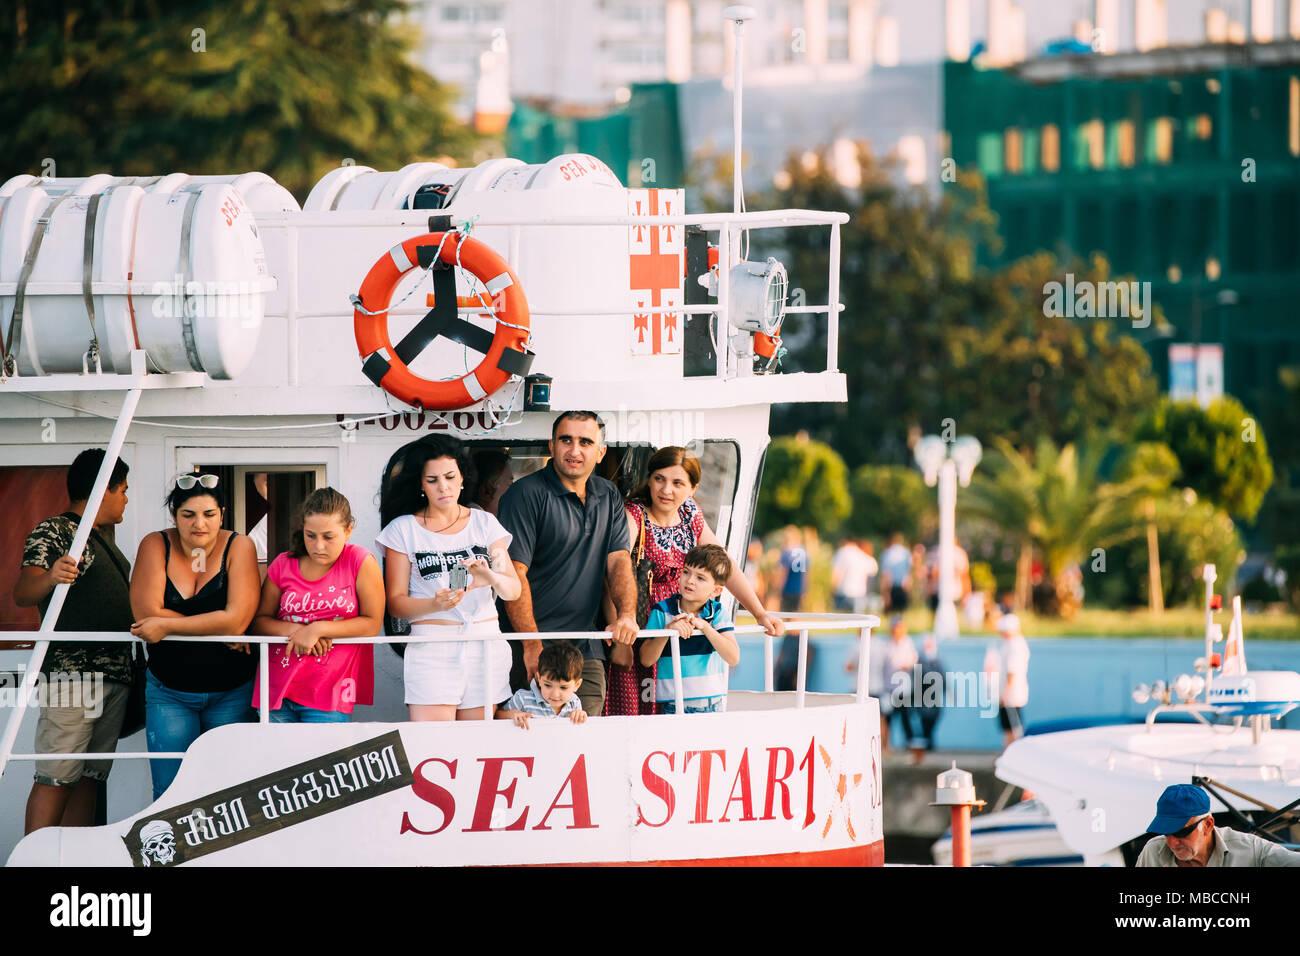 Batumi, Adjara, Georgia - September 10, 2017: People Resting In Small Pleasure Boat Tourist Boat For Cruise Near Coast In Sunny Summer Evening Stock Photo